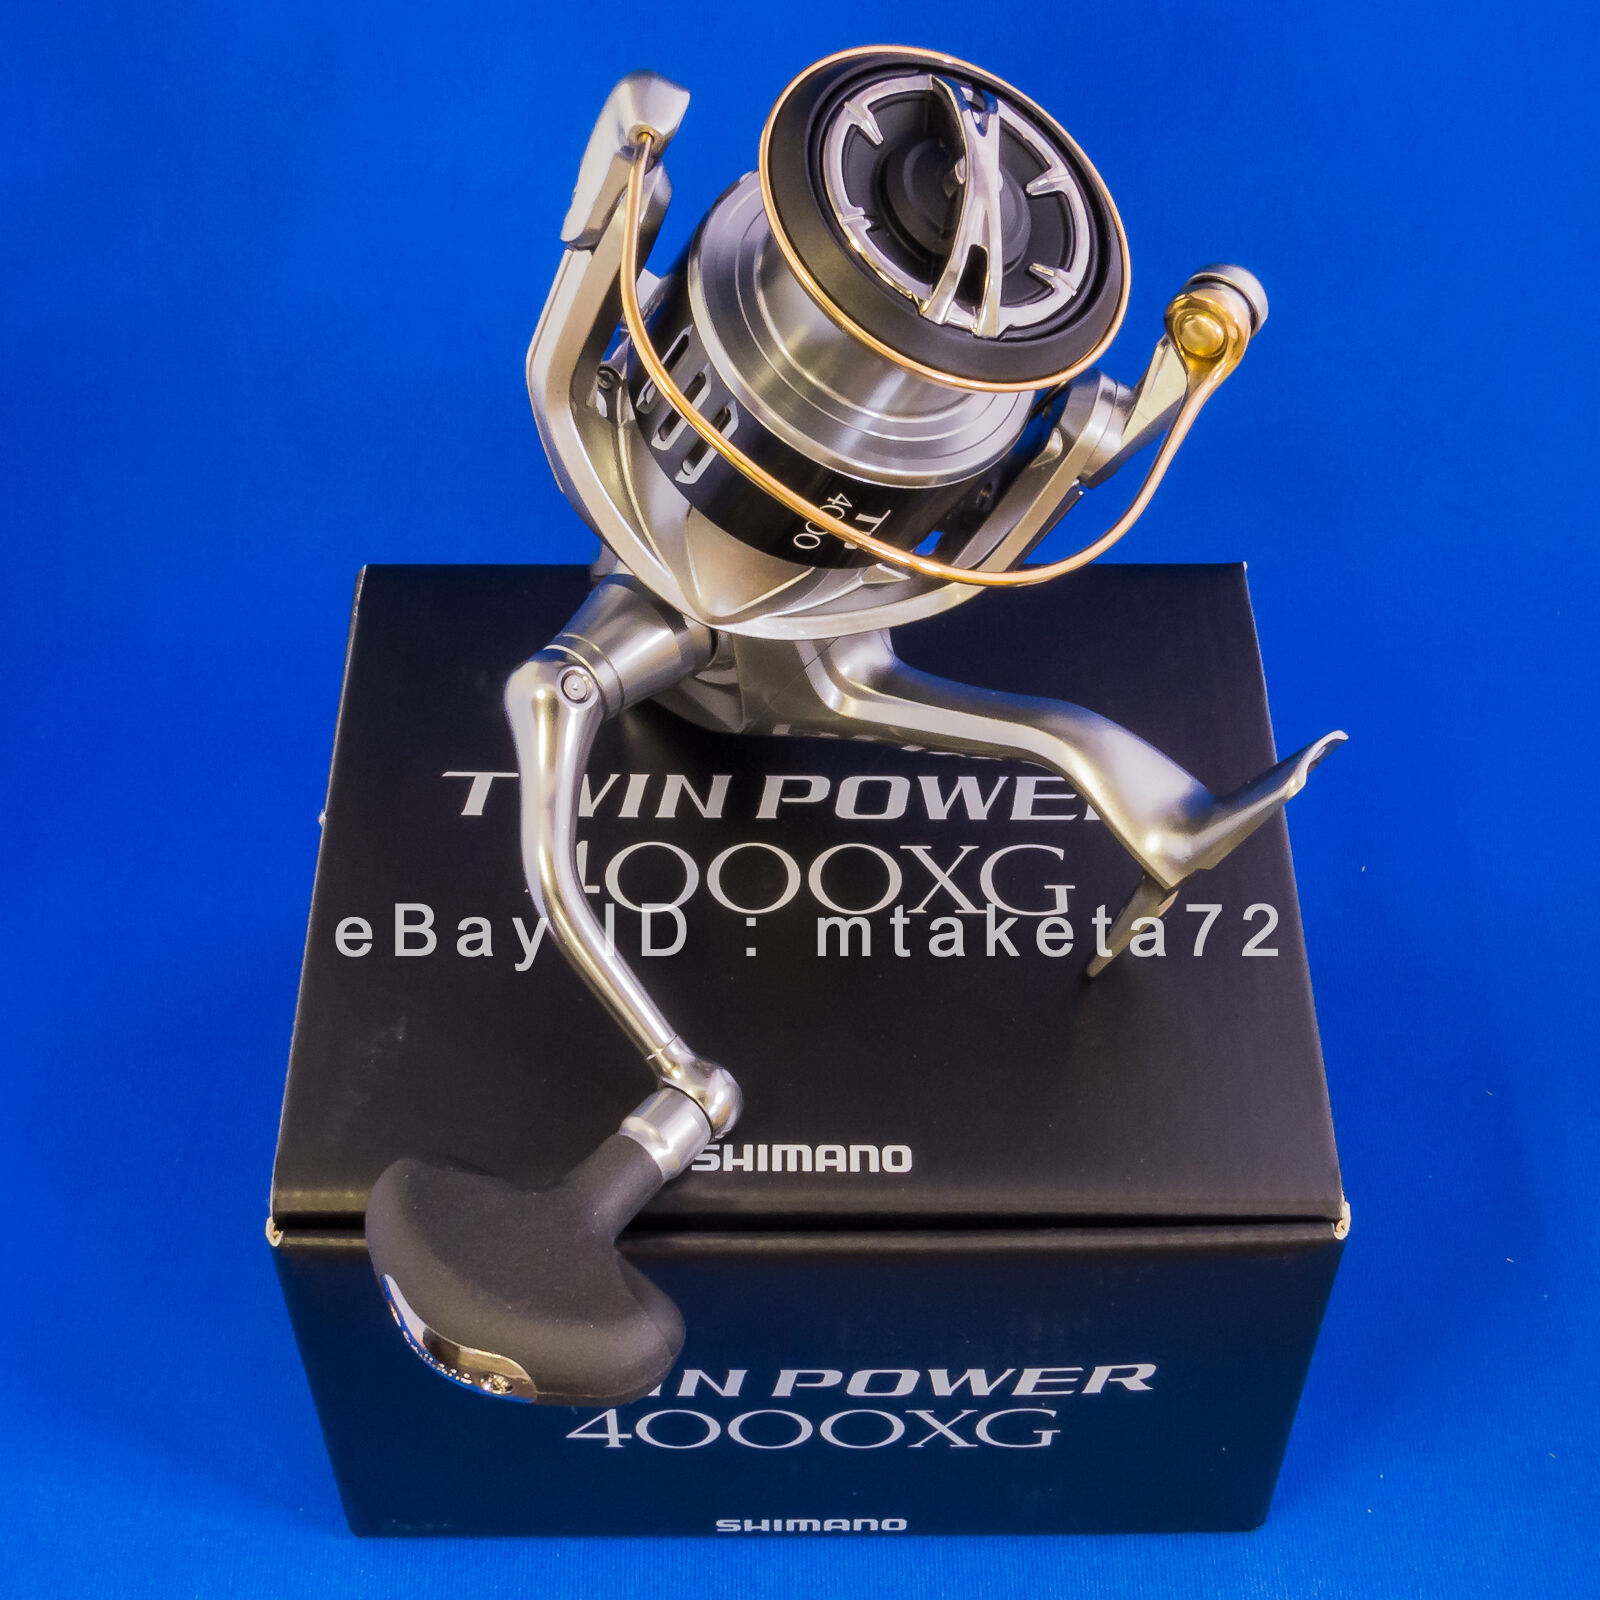 Shimano 15 TWIN POWER 4000XG, Spinning Reel Made In Japan, 033734